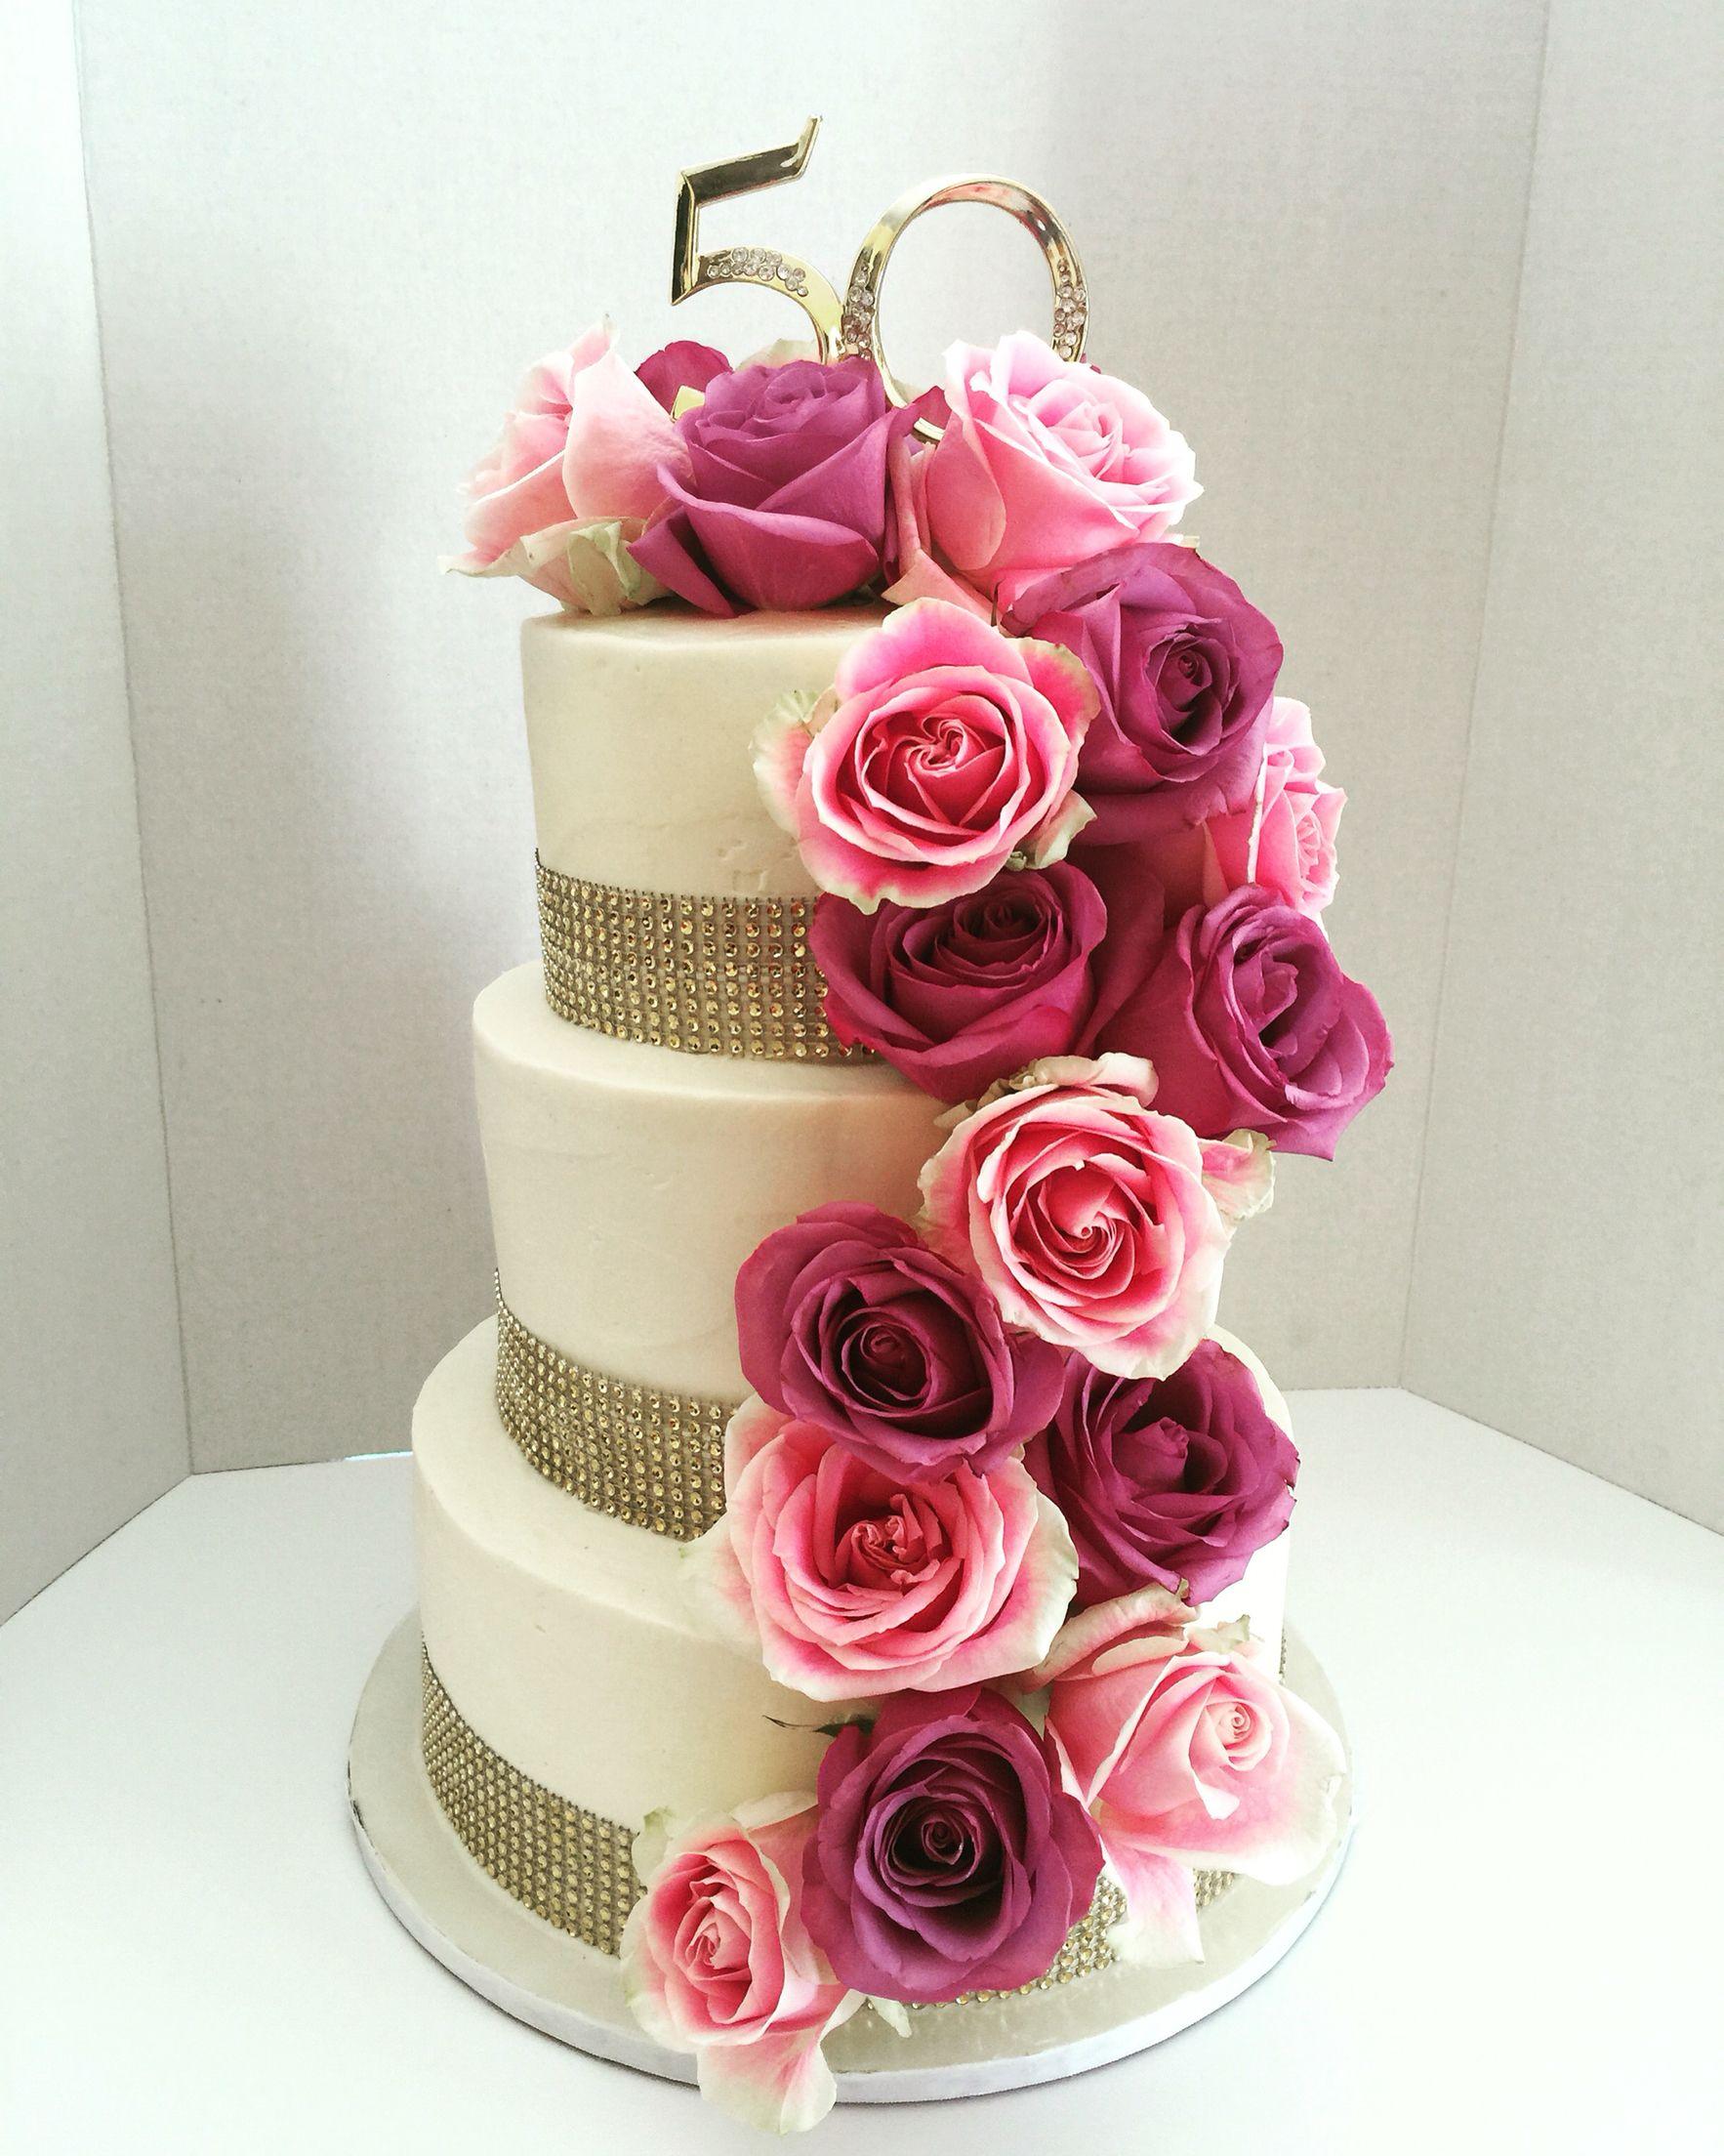 Th anniversary cake all buttercream with fresh roses yayaus